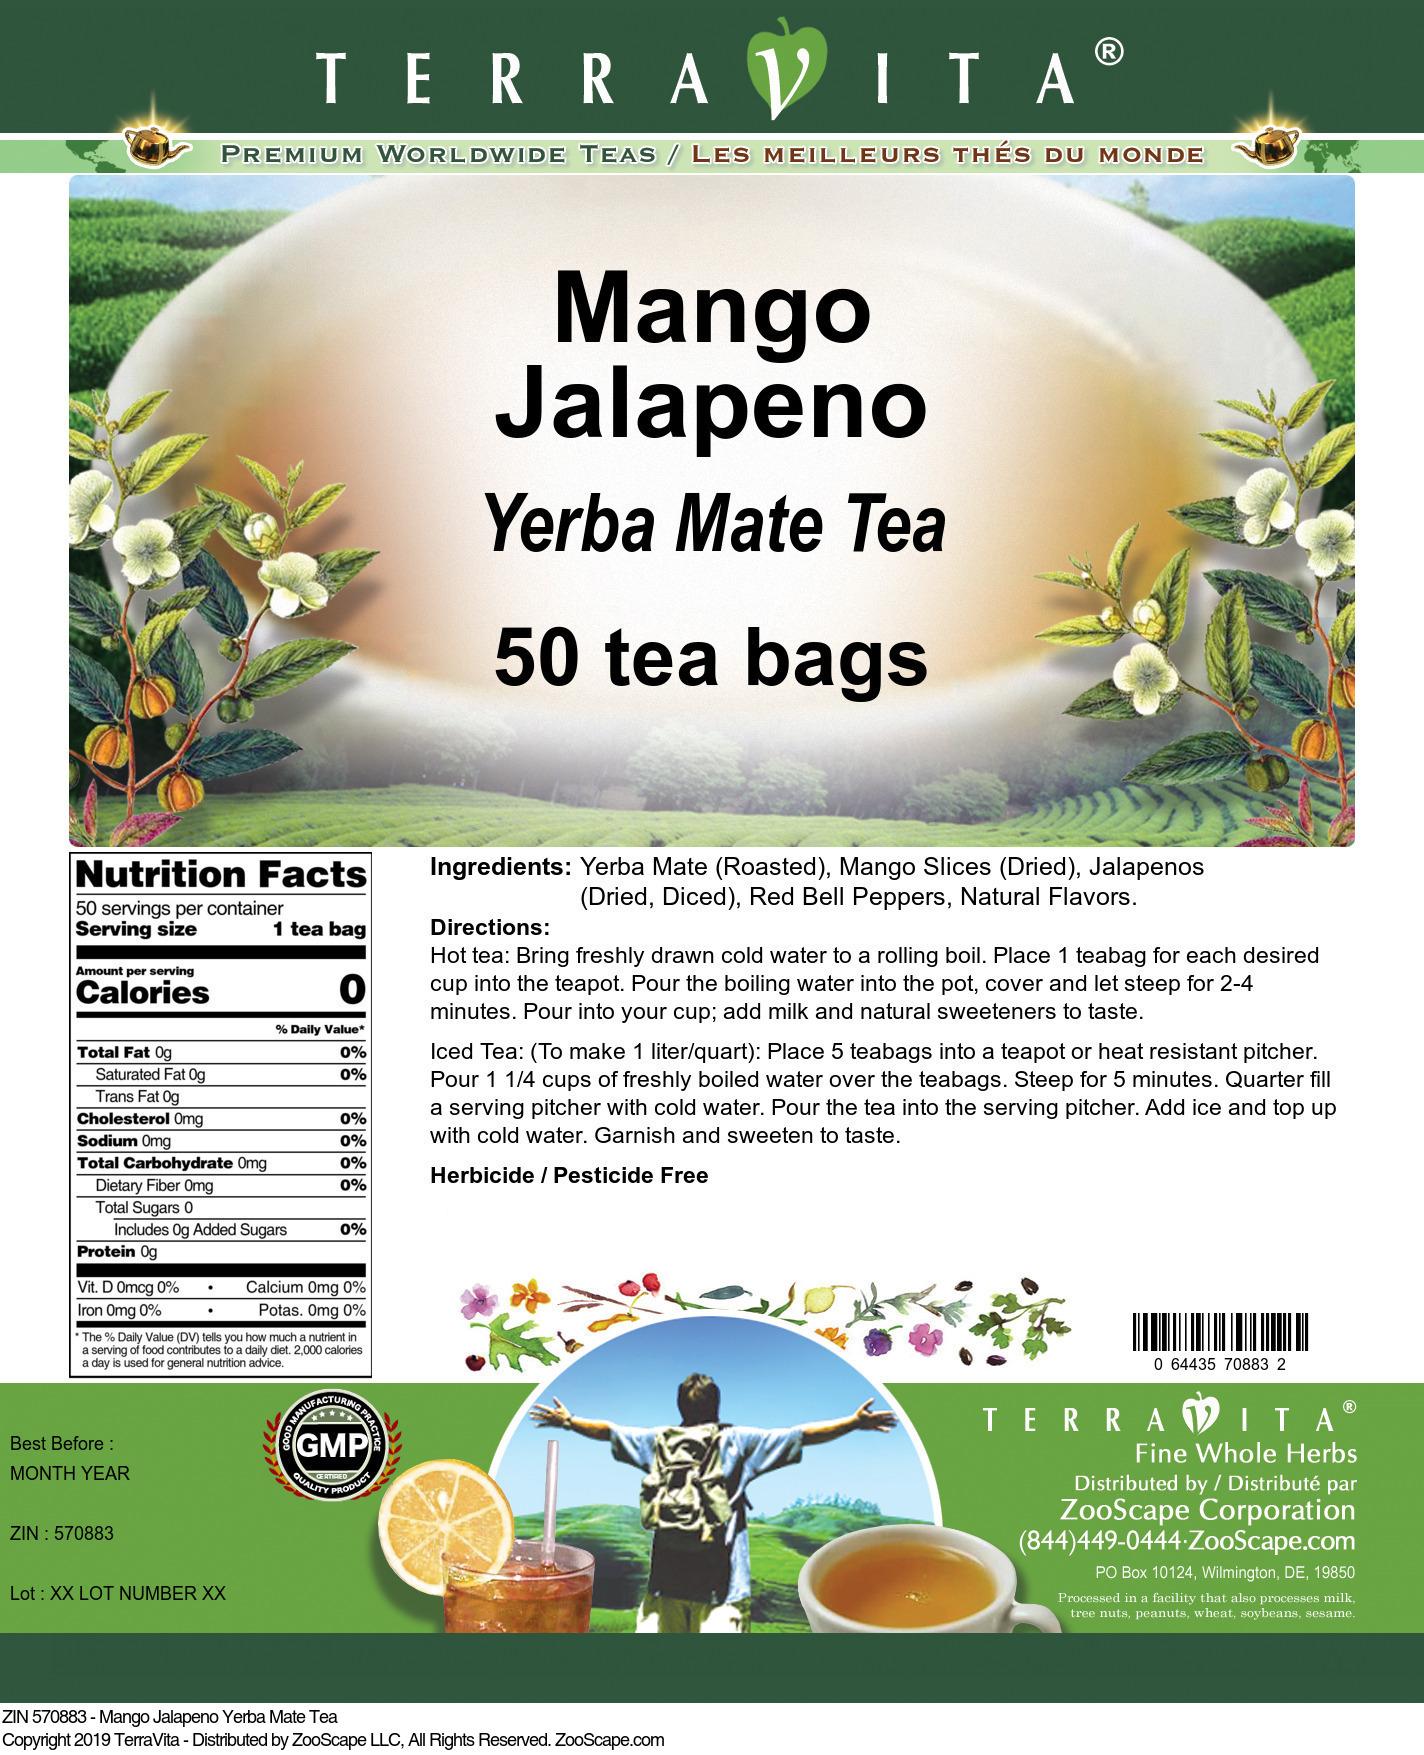 Mango Jalapeno Yerba Mate Tea